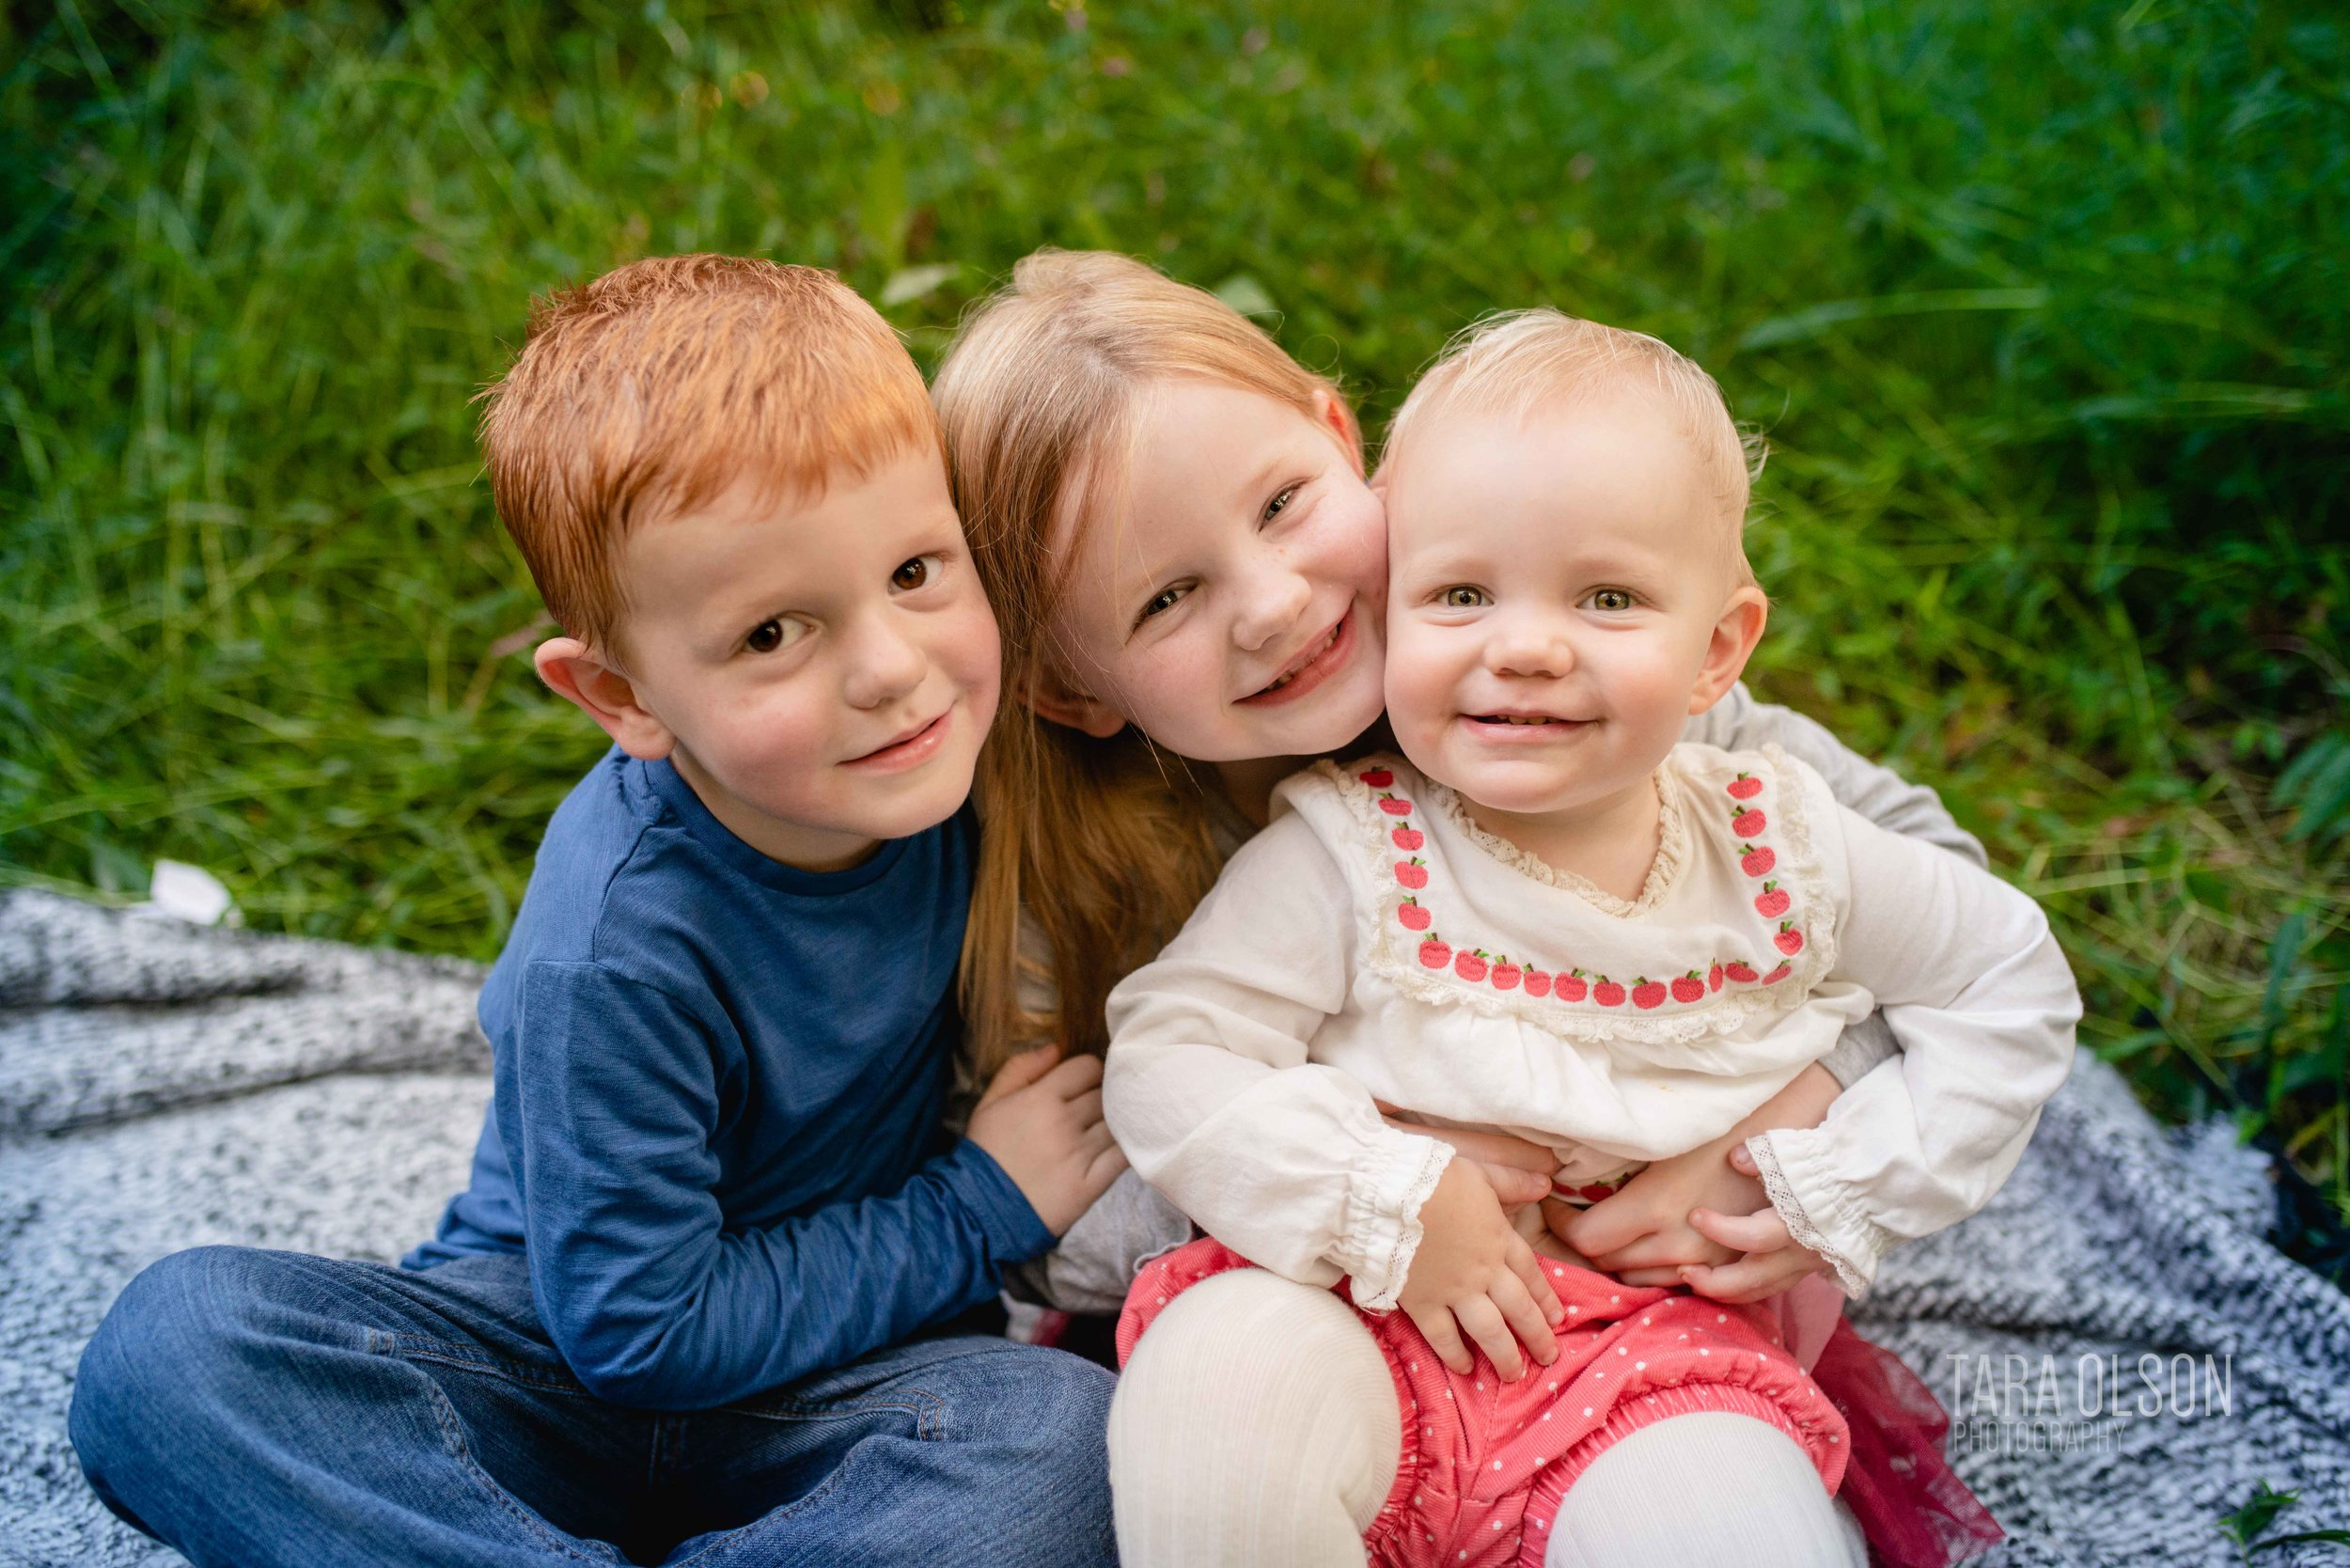 Hawkins_Arlington-Virginia-Family-Photographer_Tara-Olson-Photography_4223.jpg